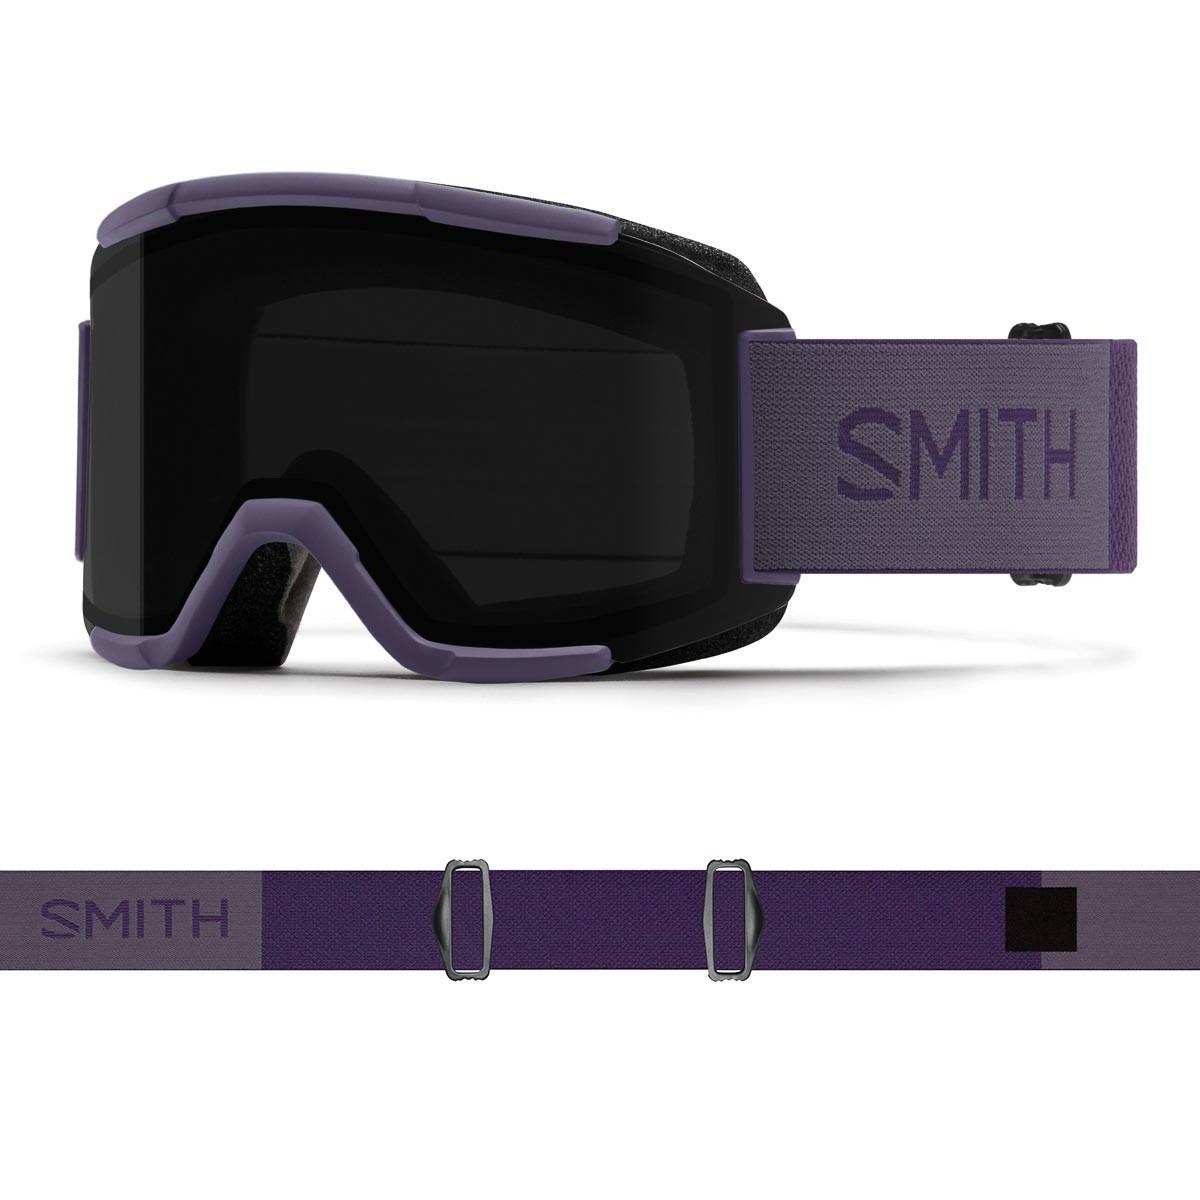 SMITH SQUAD violet 2021 | S3 CHROMAPOP Sun Black Mirror - Изображение - AQUAMATRIX